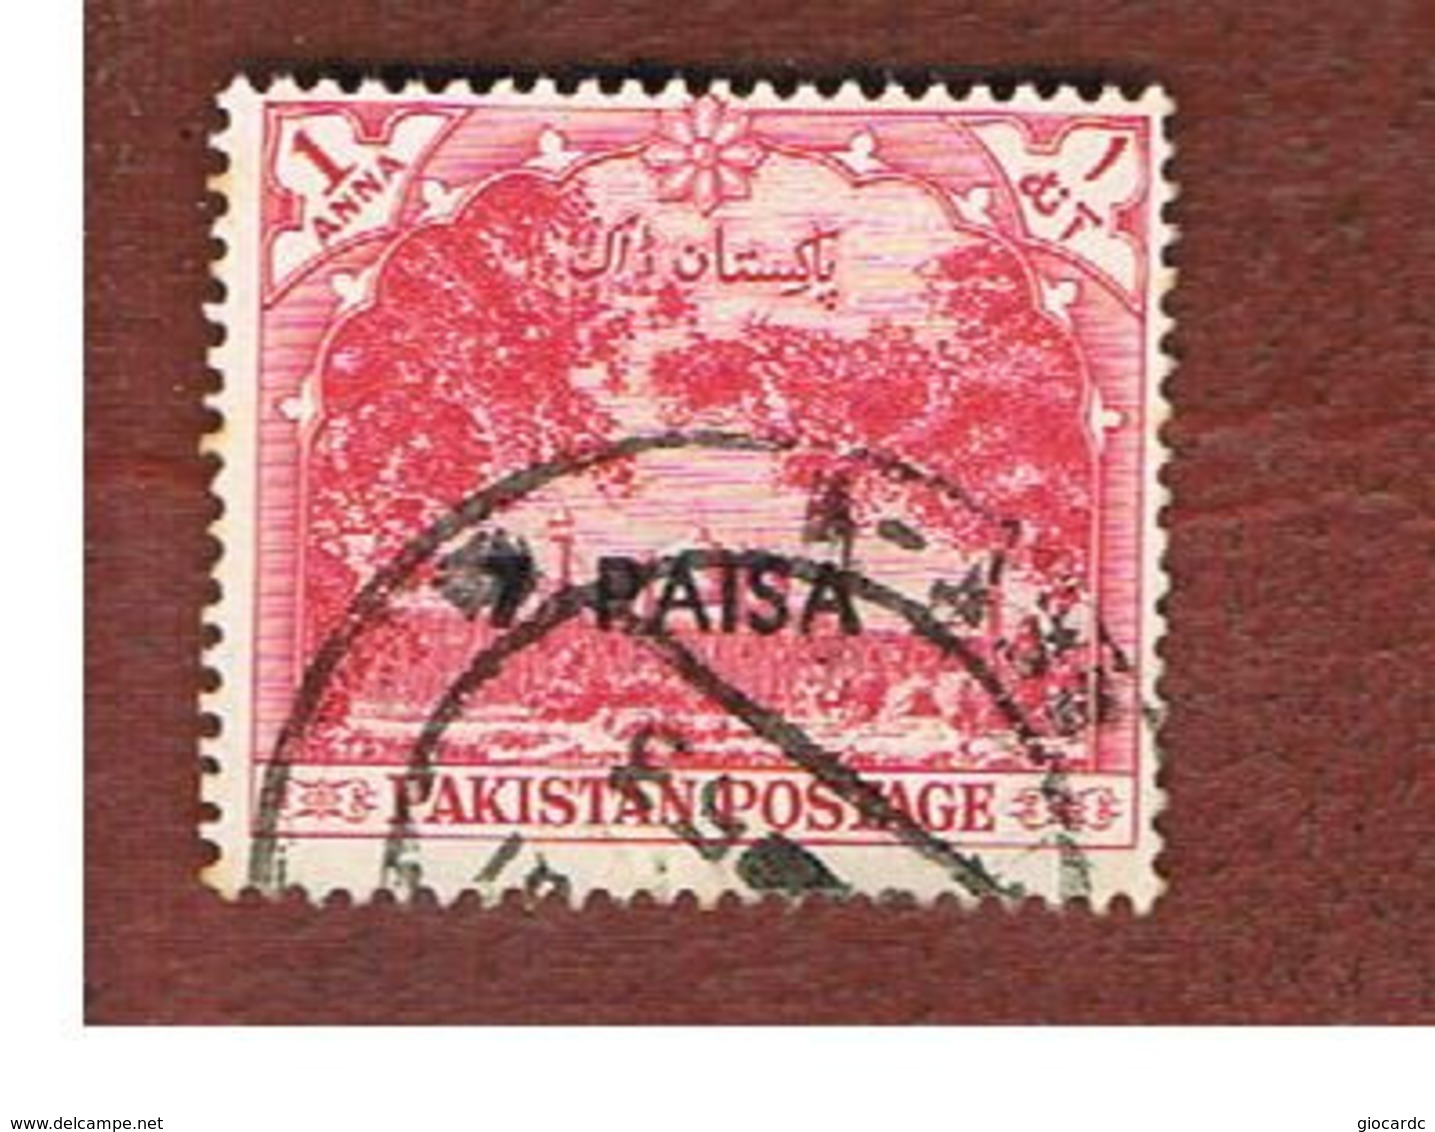 PAKISTAN  -  SG 125 -  1961  STAMP OF 1954 (OVERPRINTED 7 PAISA)  -  USED ° - Pakistan